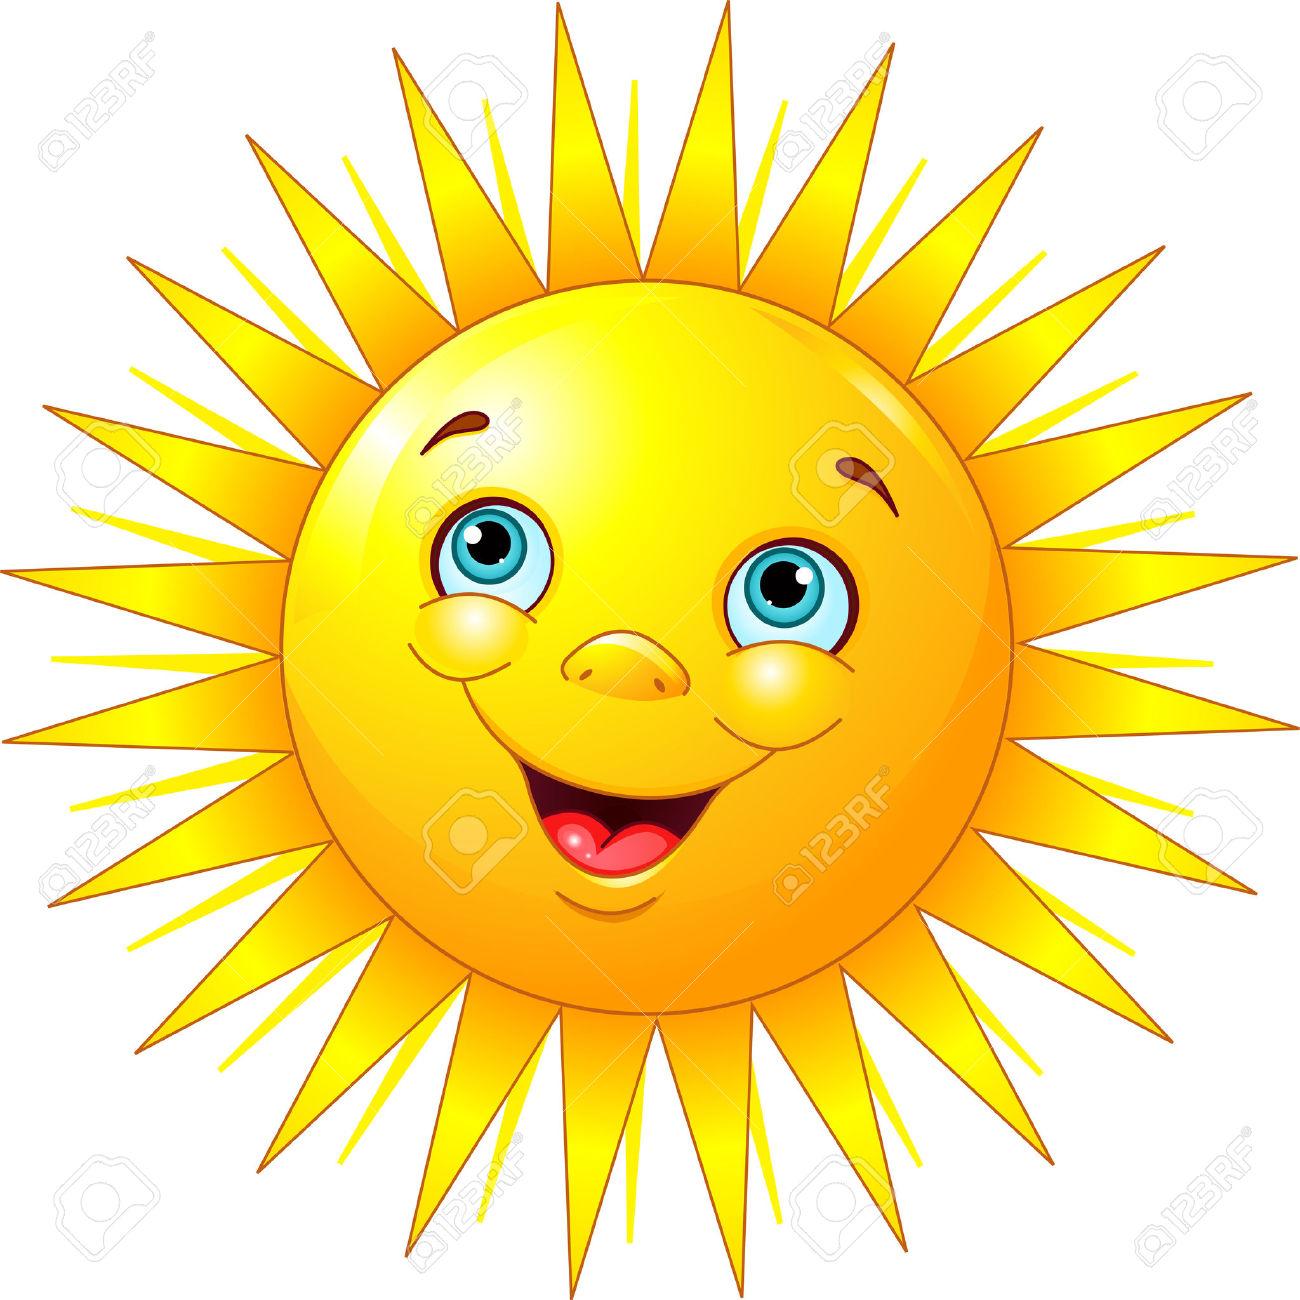 clipart sunshine: Illustration of smiling sun character Illustration